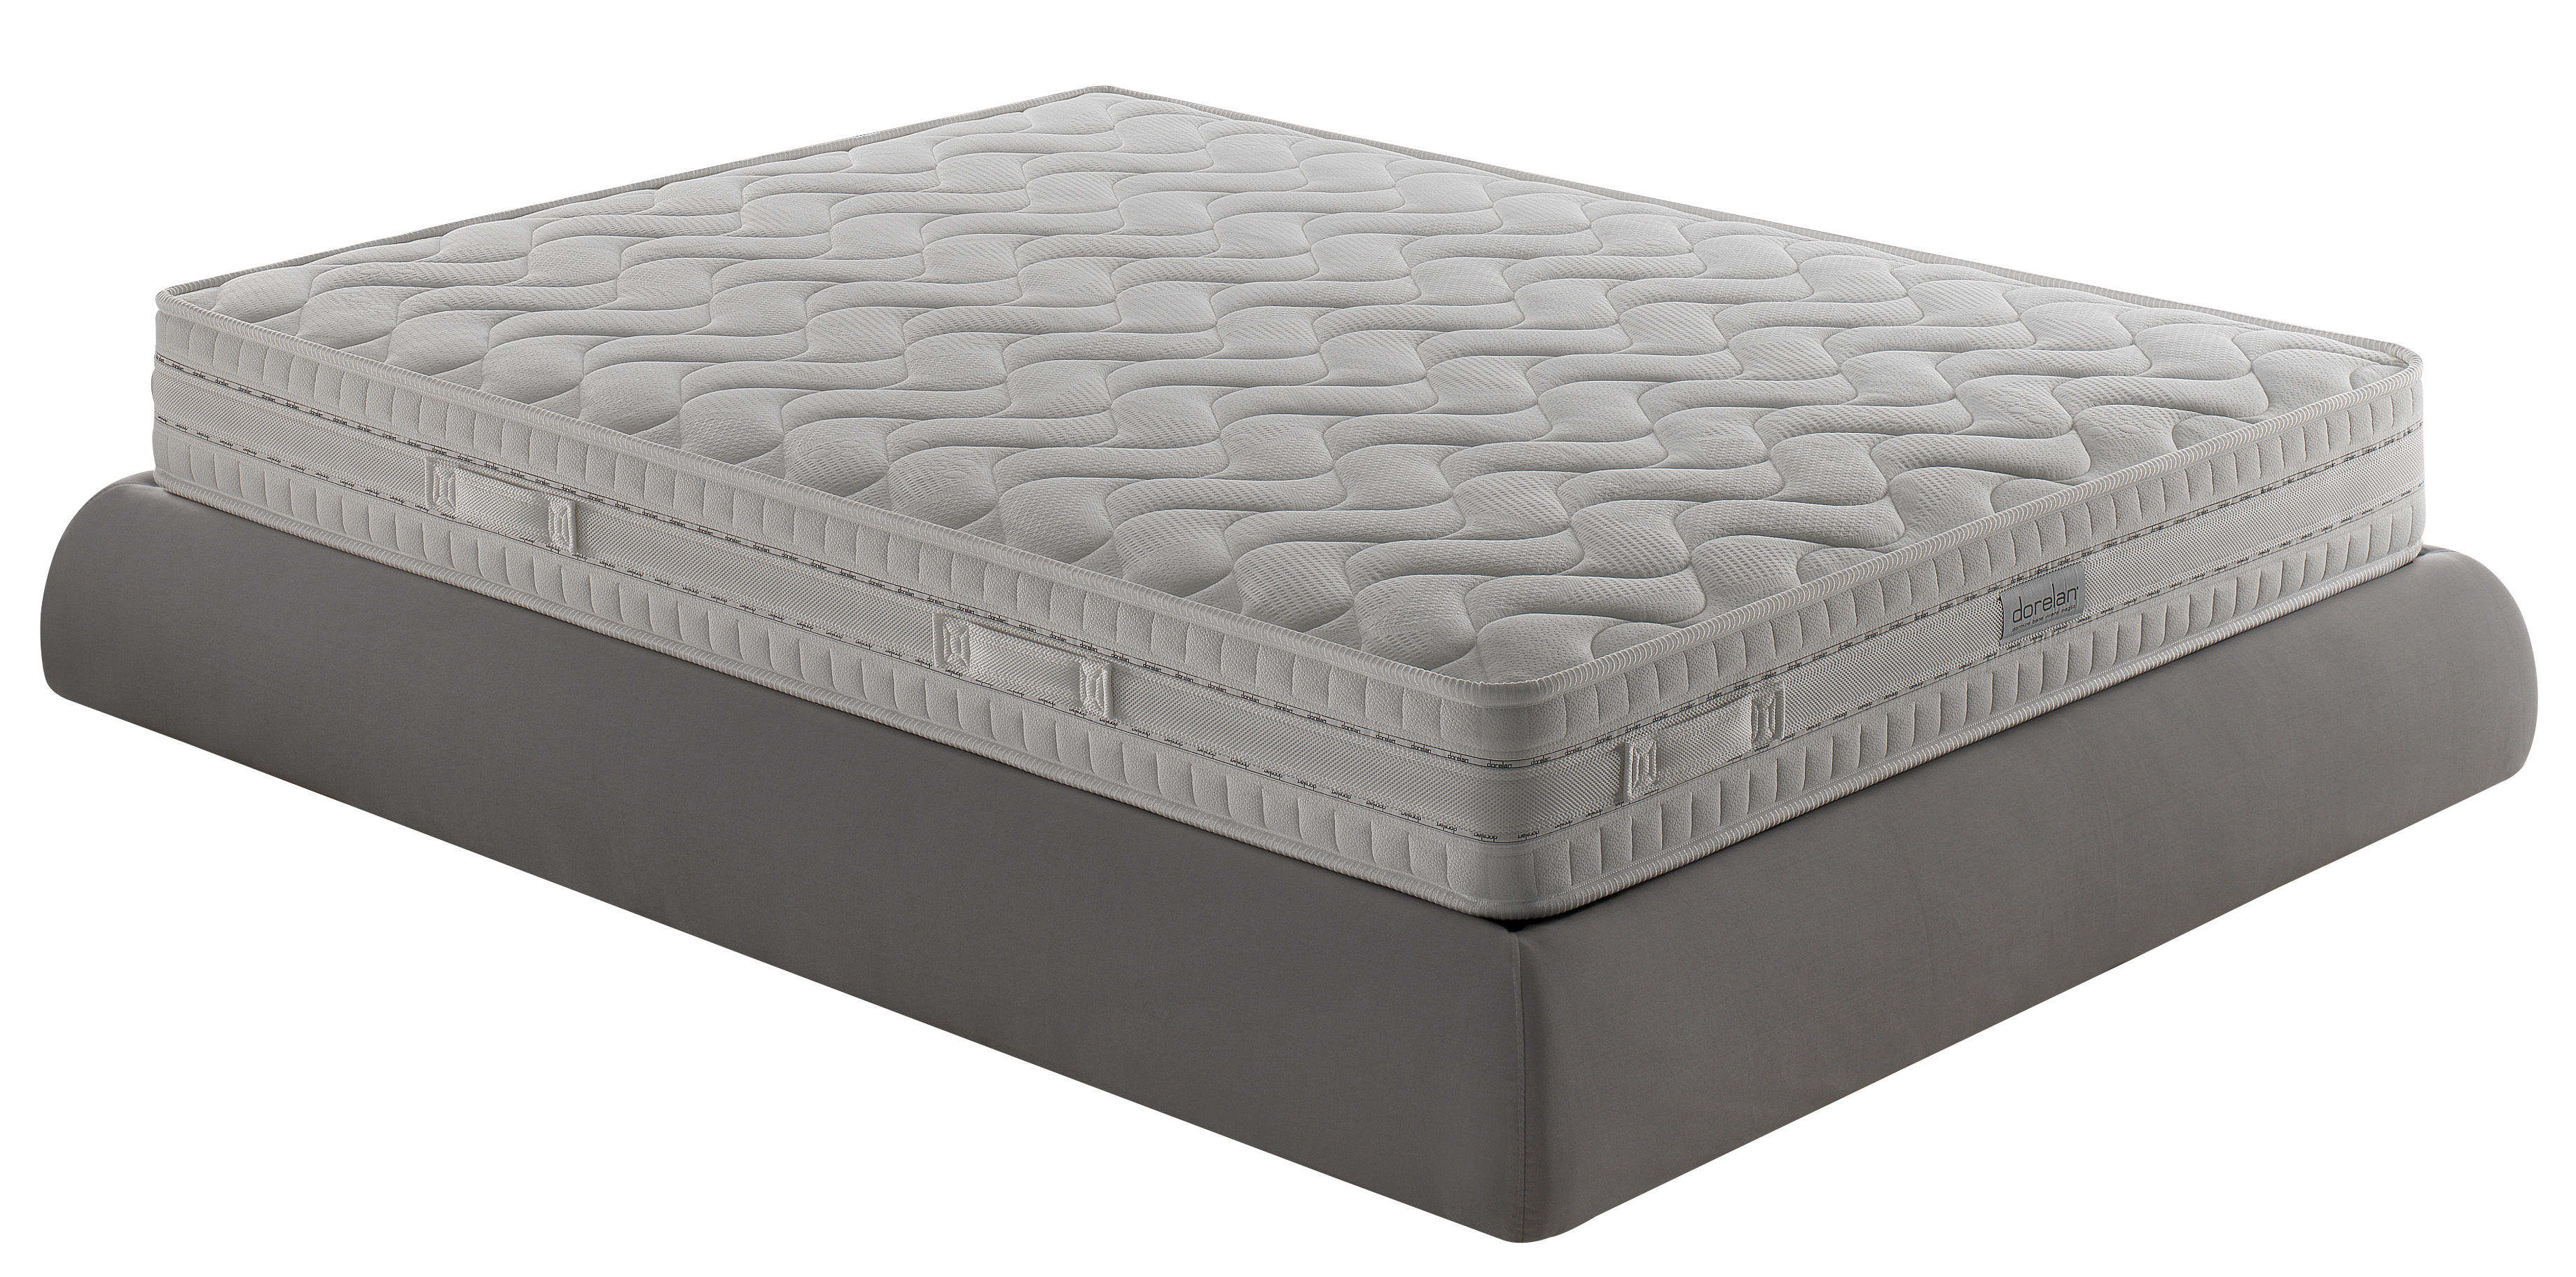 matelas 2 personnes top 160 x 200 cm ressorts 160 x 200 cm dorelan. Black Bedroom Furniture Sets. Home Design Ideas